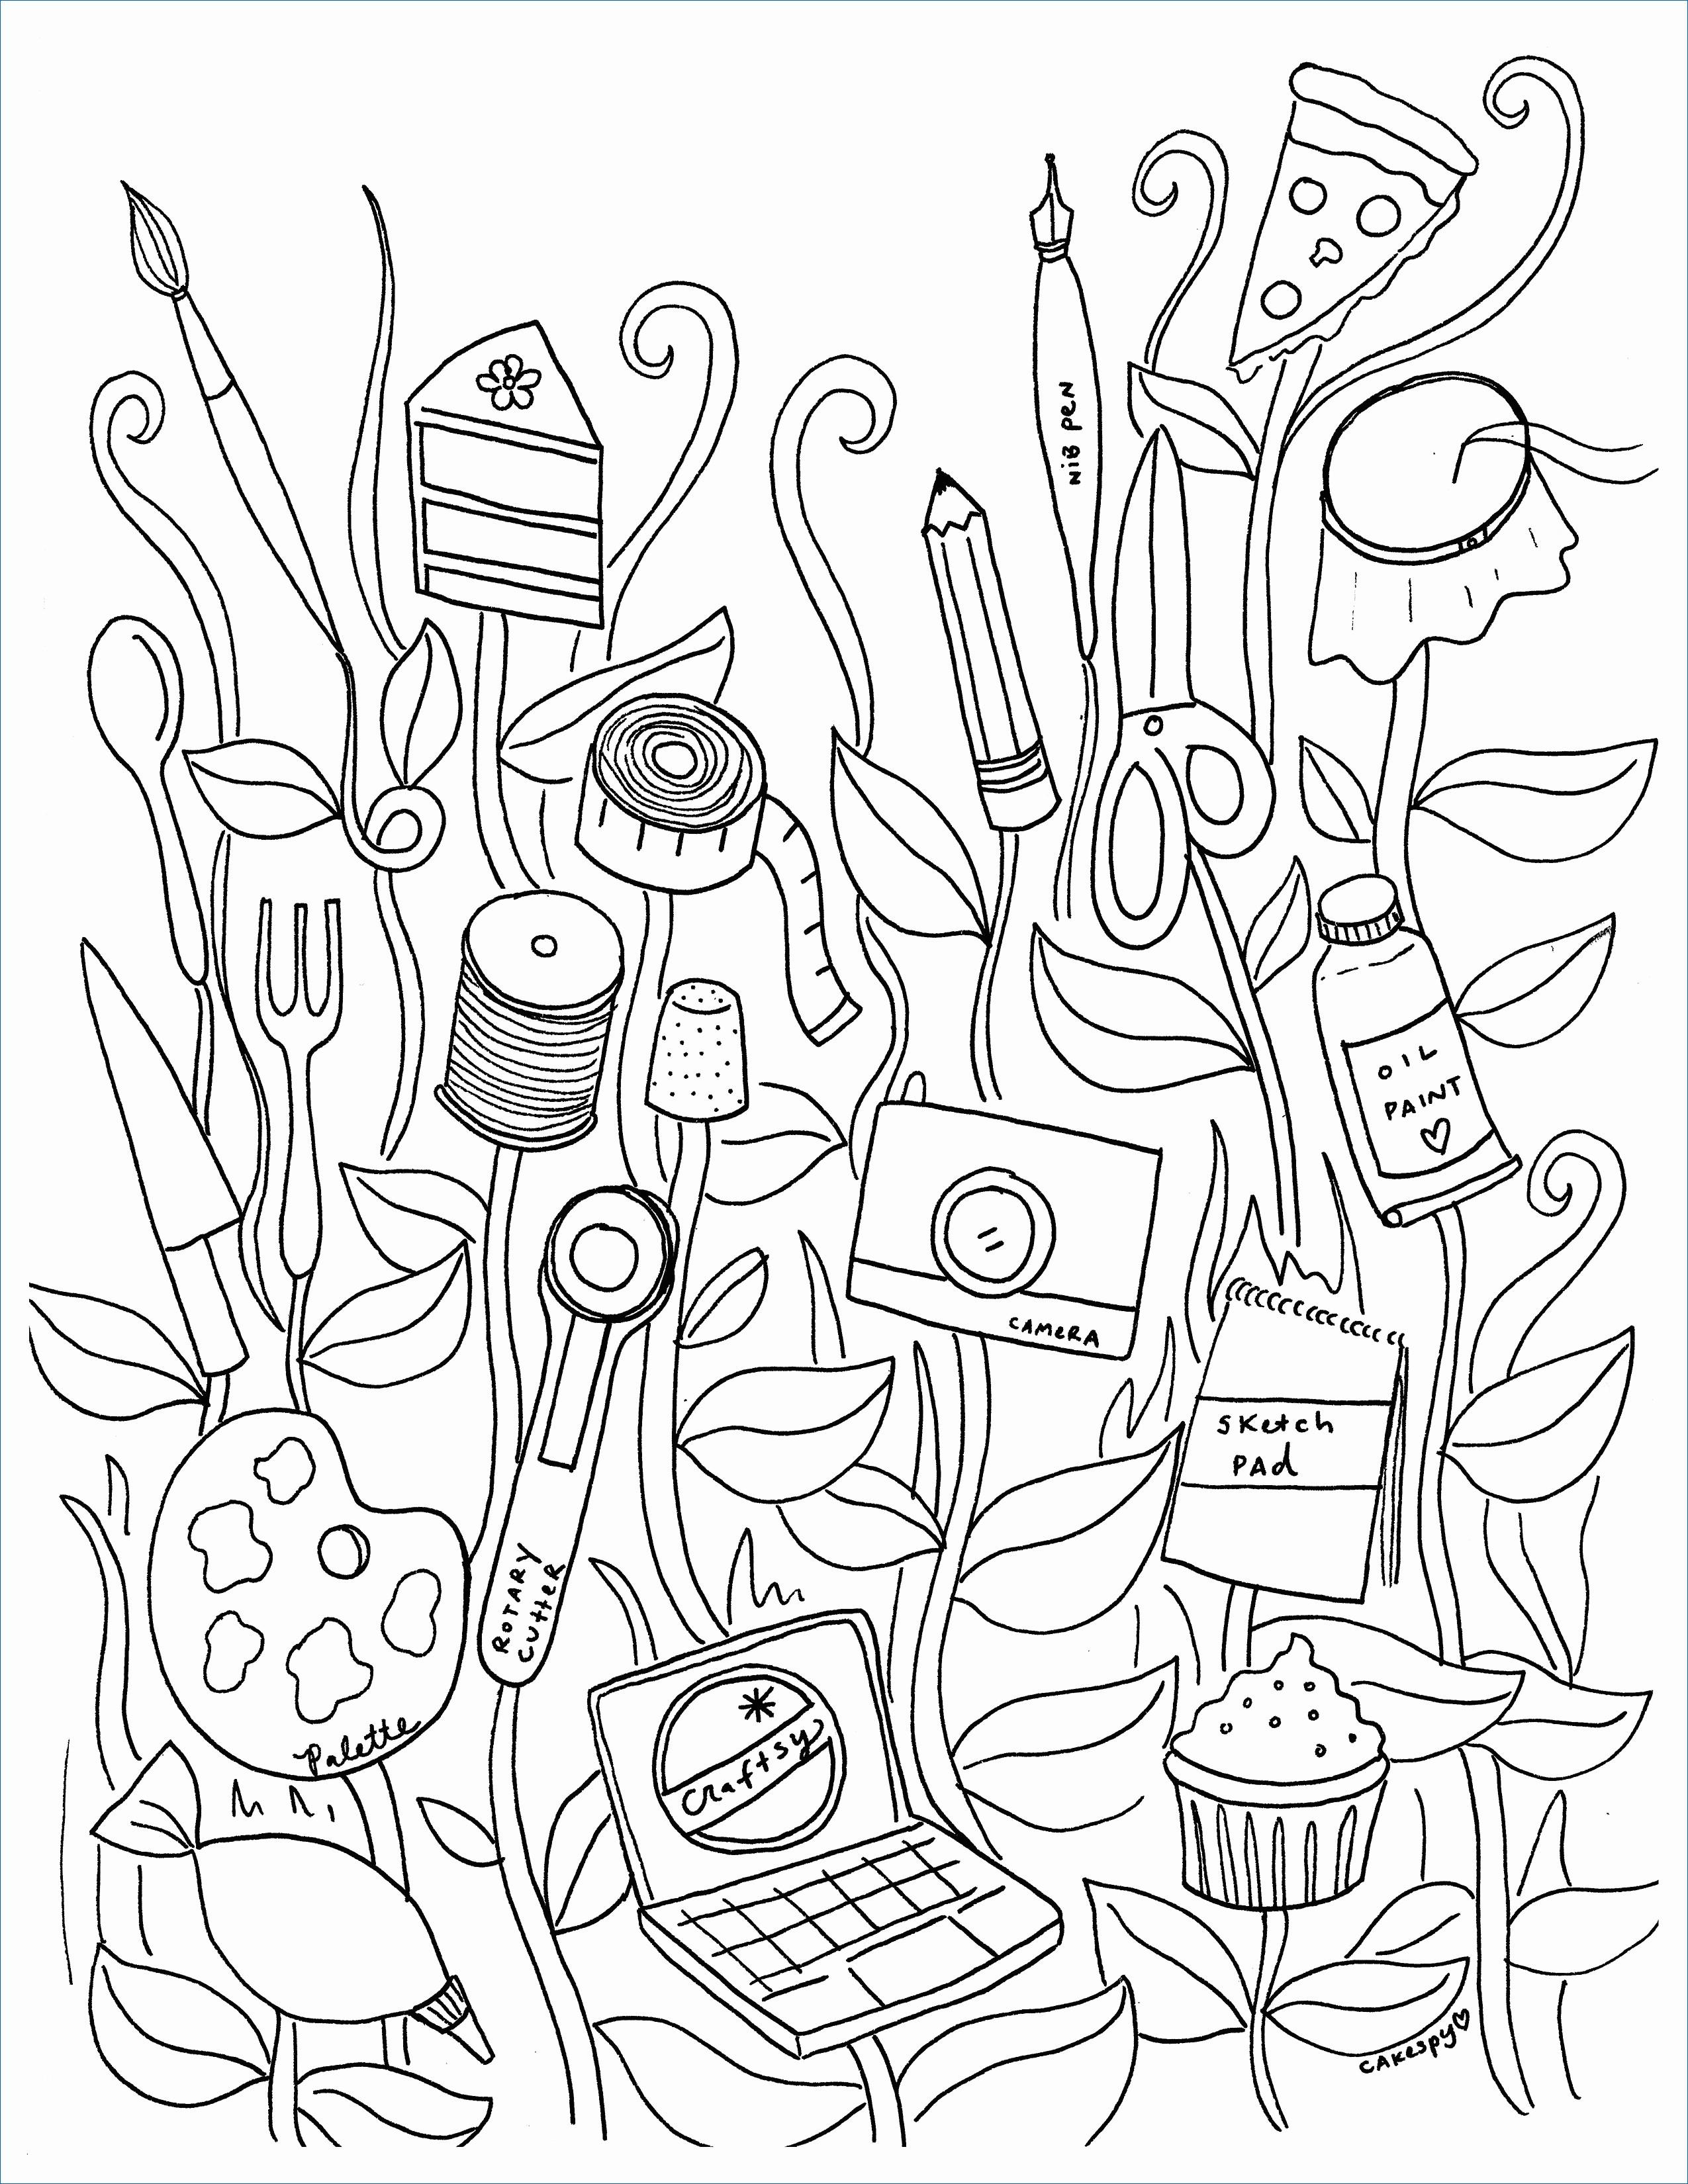 Mia and Me Coloring Pages Einzigartig Coloring for Me Best 40 Mia Me Ausmalbilder Scoredatscore Galerie